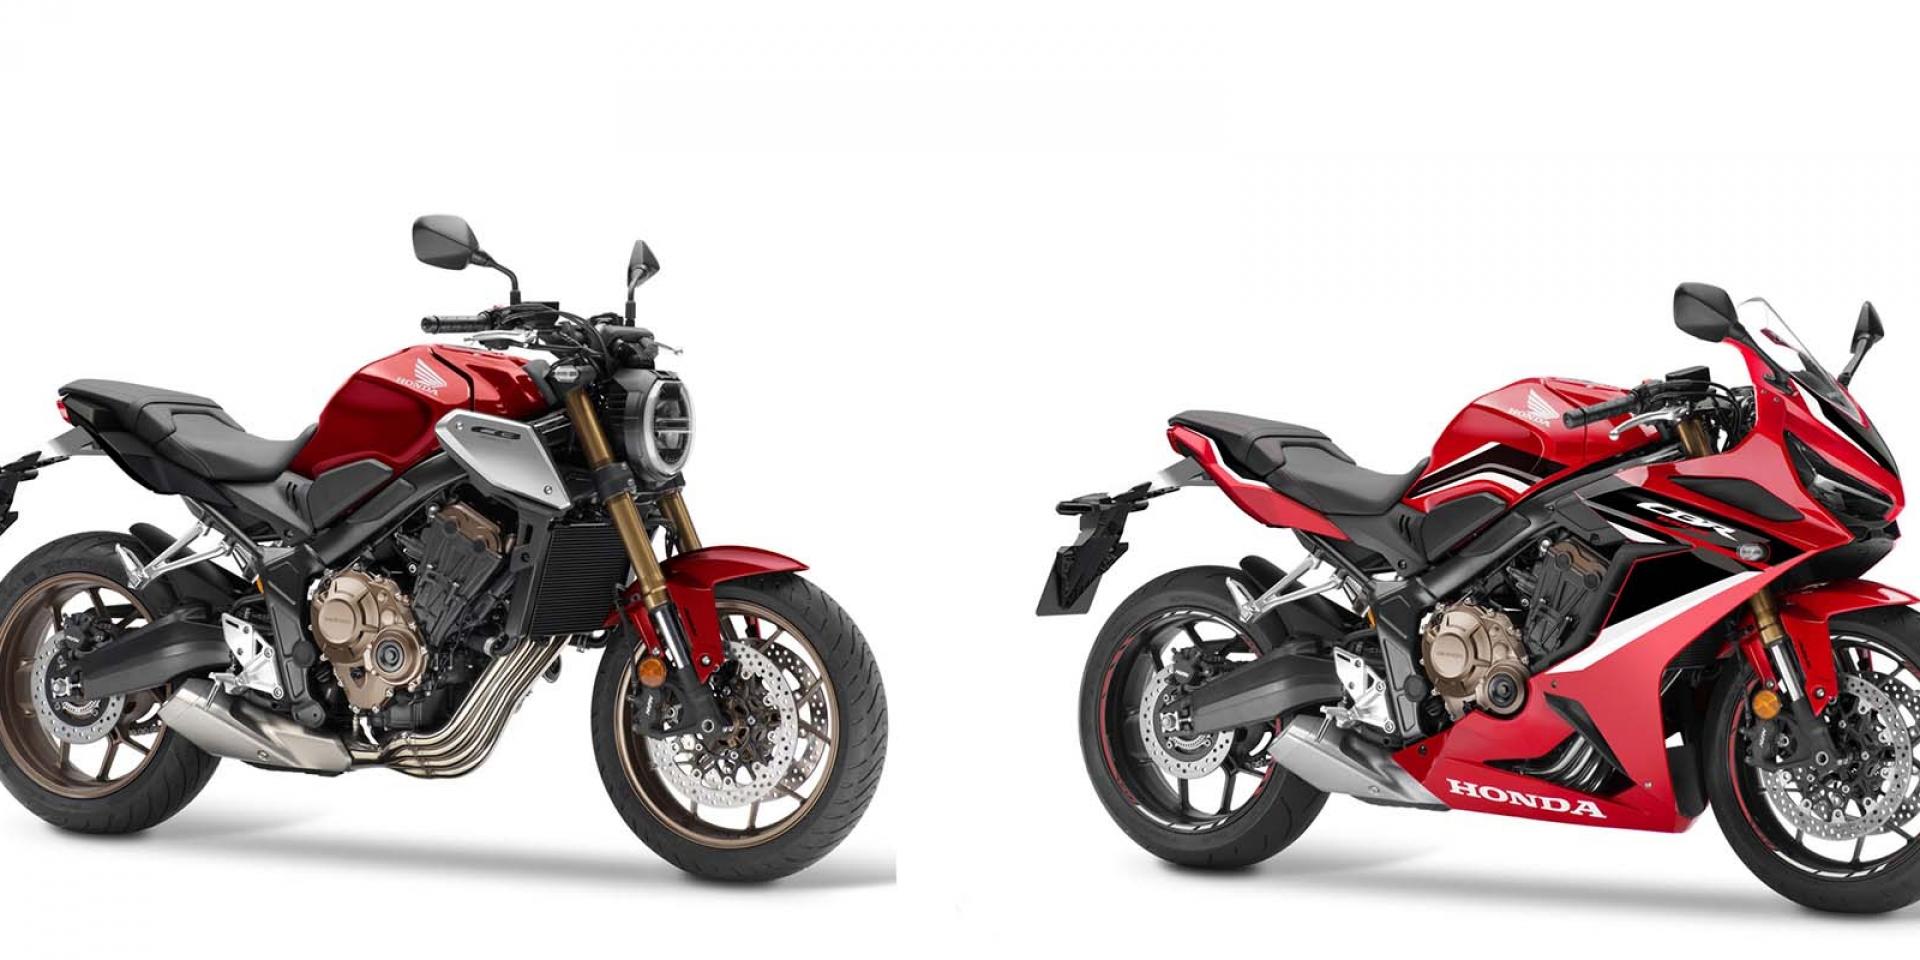 官方新聞稿。Honda Motorcycle 2021年式 新車登場  FORZA350 26.8萬 CB650R 37.9萬 CBR650R 39.9萬